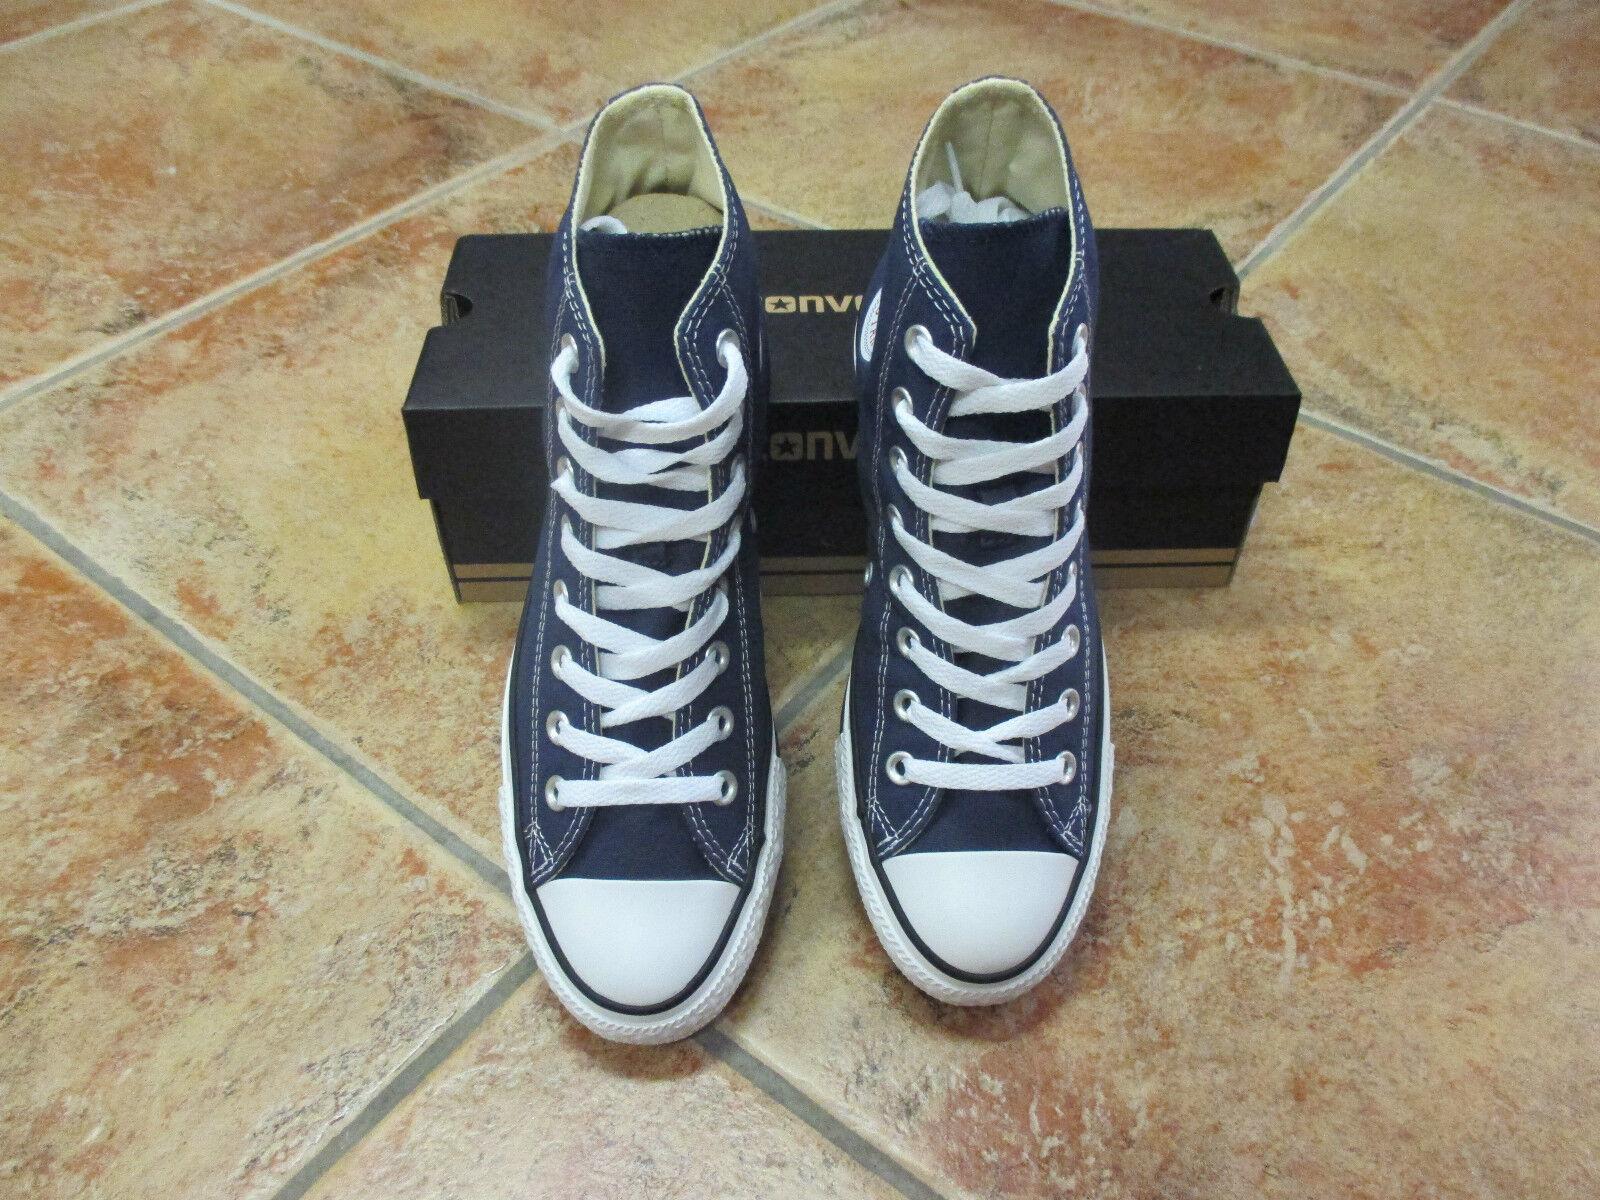 Converse Chucks All Star HI Größe 41 blau navy M9622C Sneaker Neu